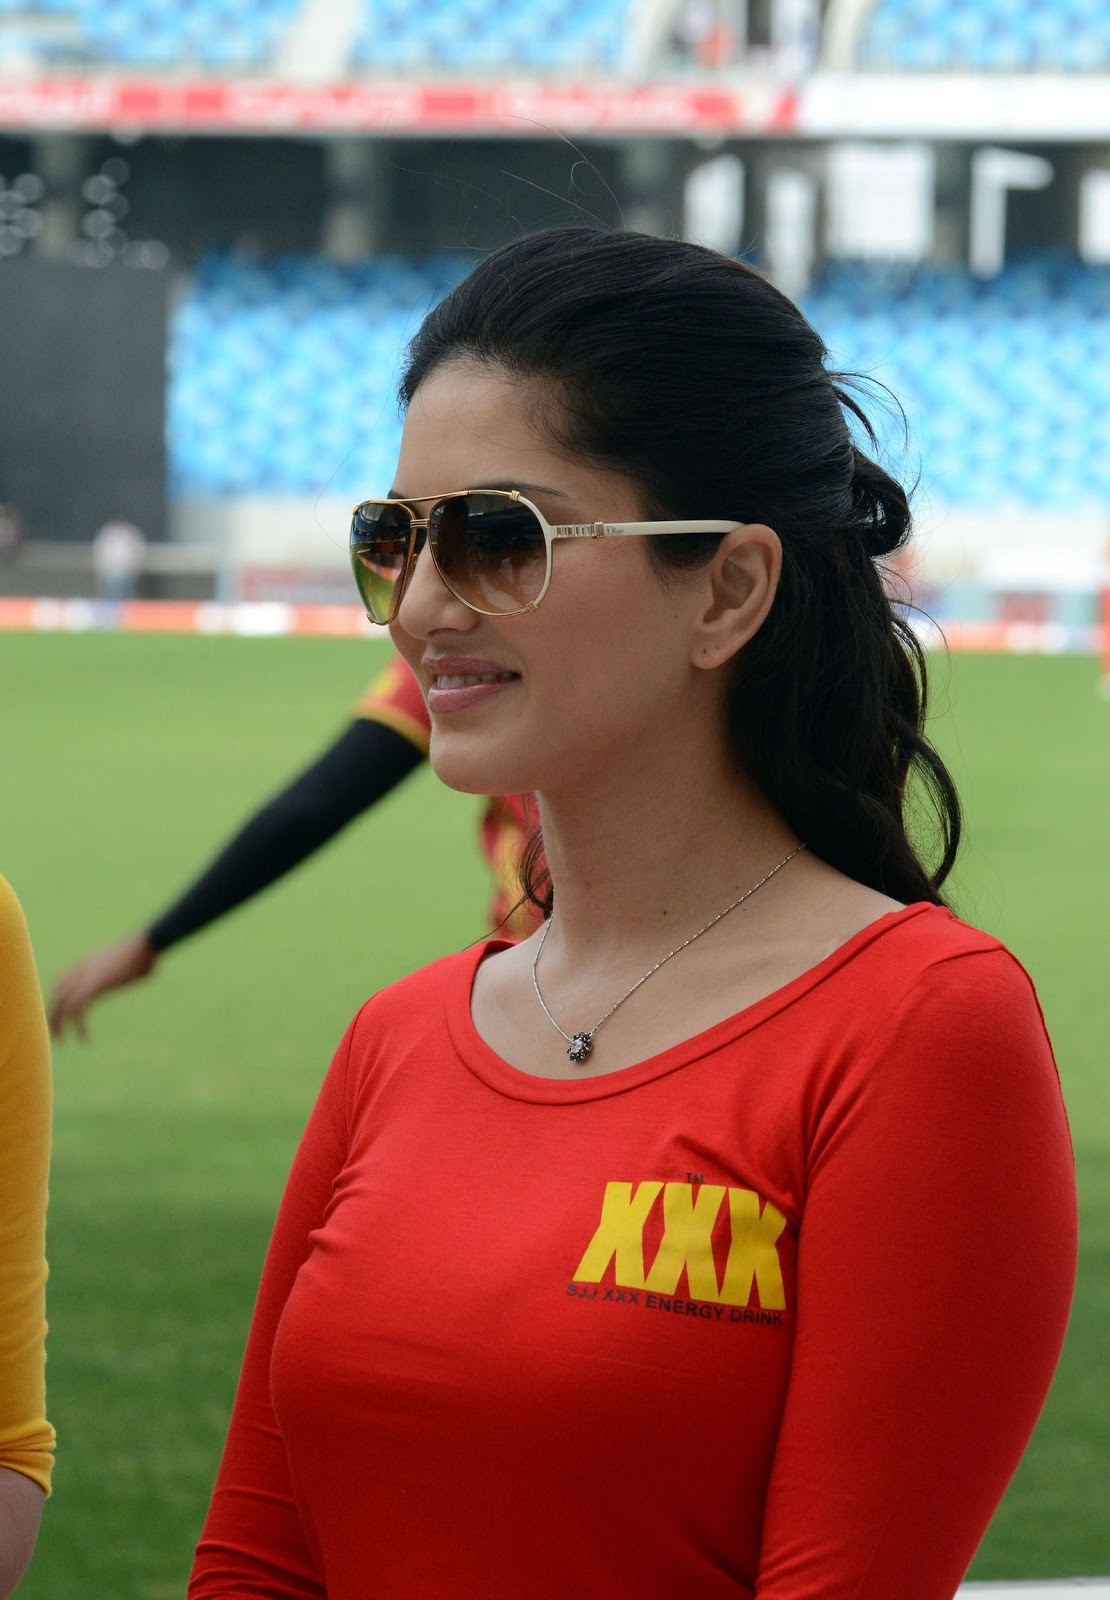 Porn Star Sunny Leone Wear Xxx Shirt During Ccl Match -9776